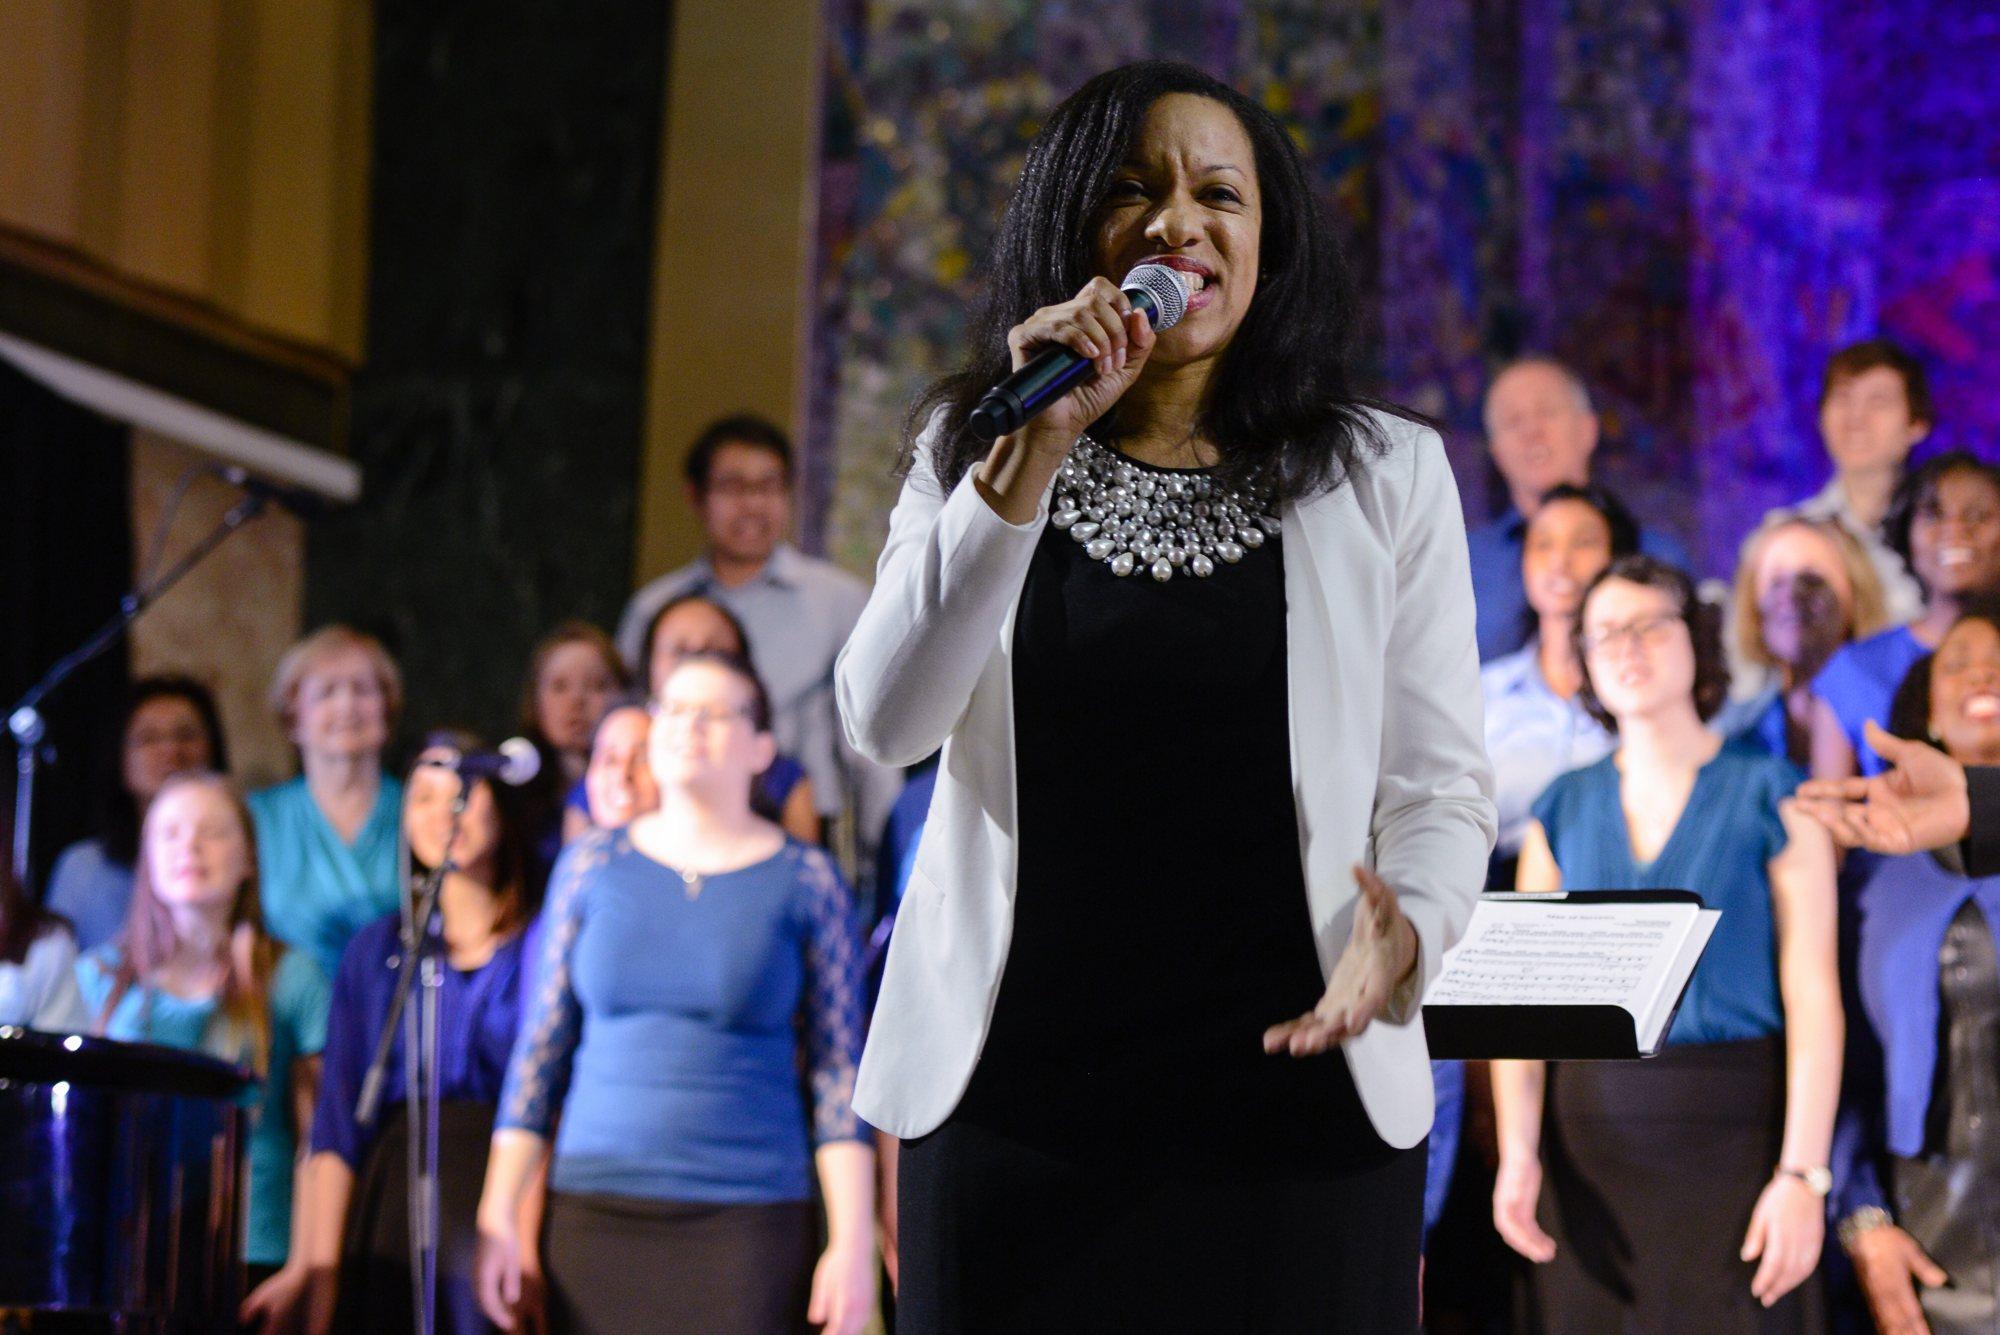 Dr. Melissa Davis